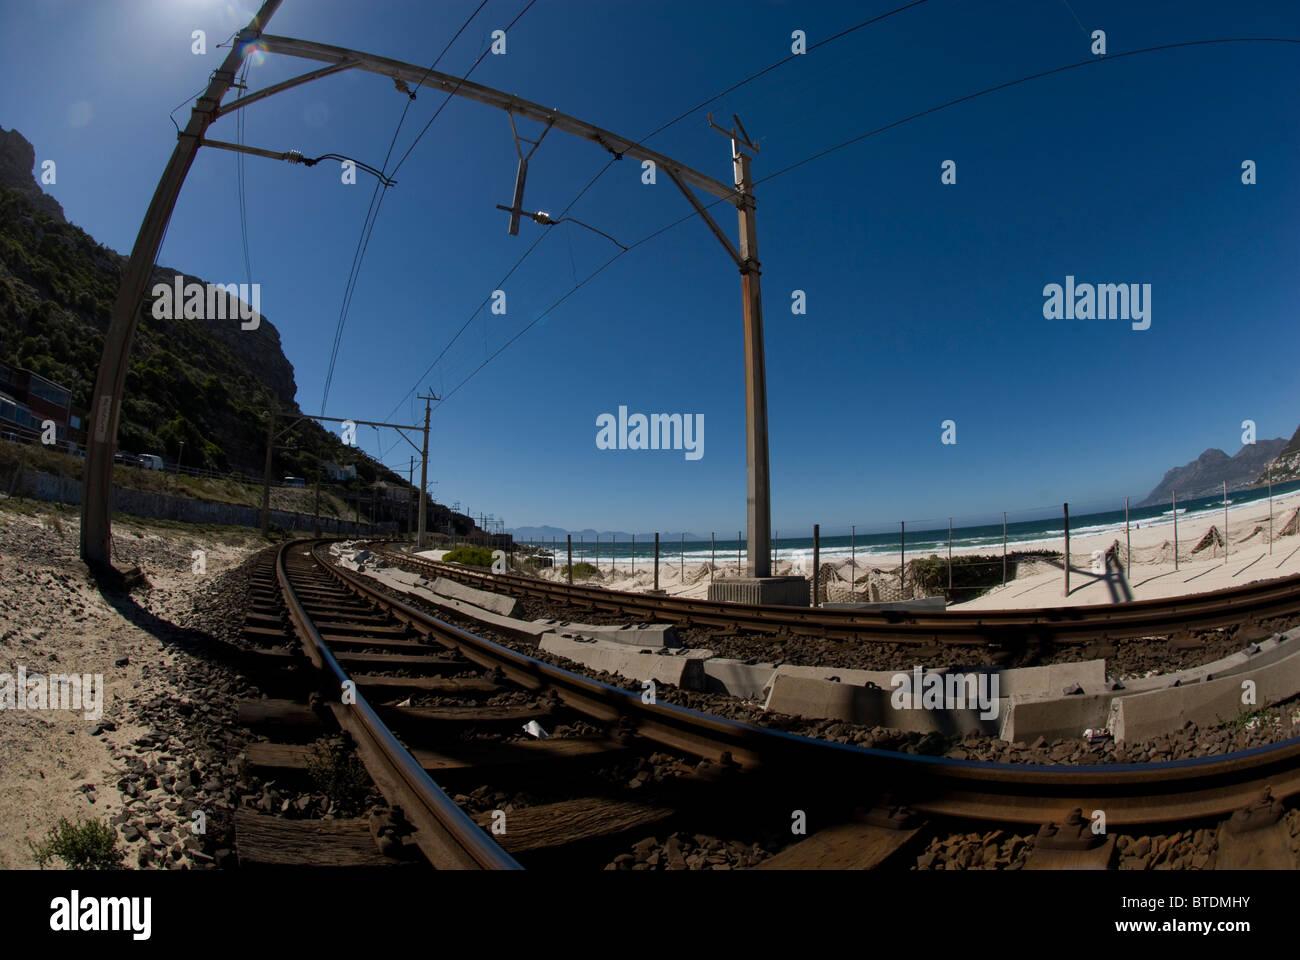 Fish-eye view of railway tracks - Stock Image